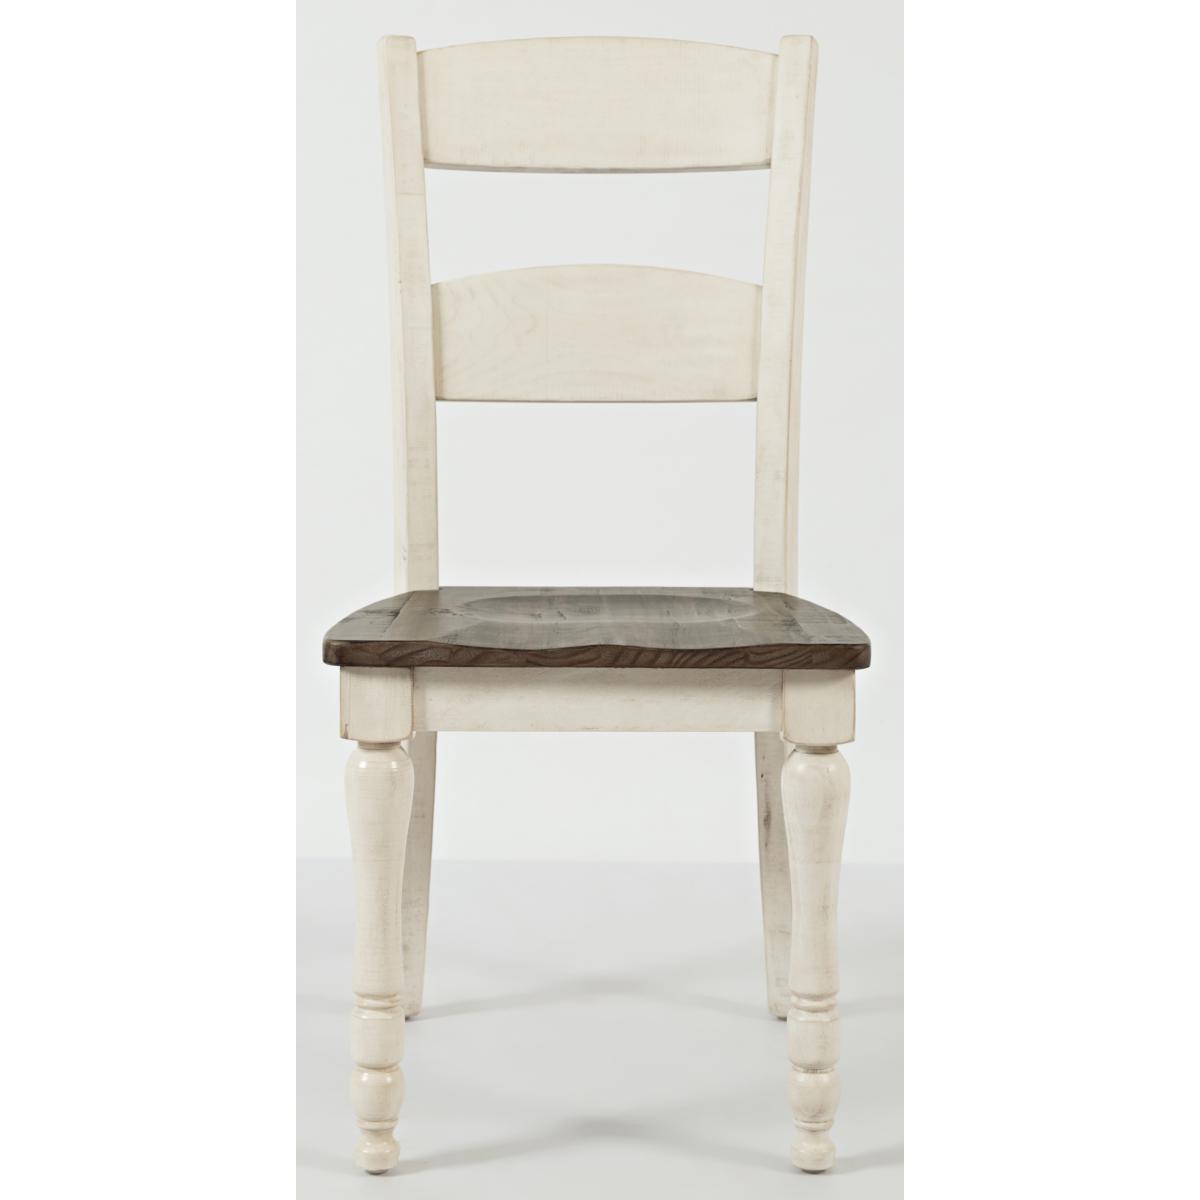 Ginger Ladderback Dining Chair White